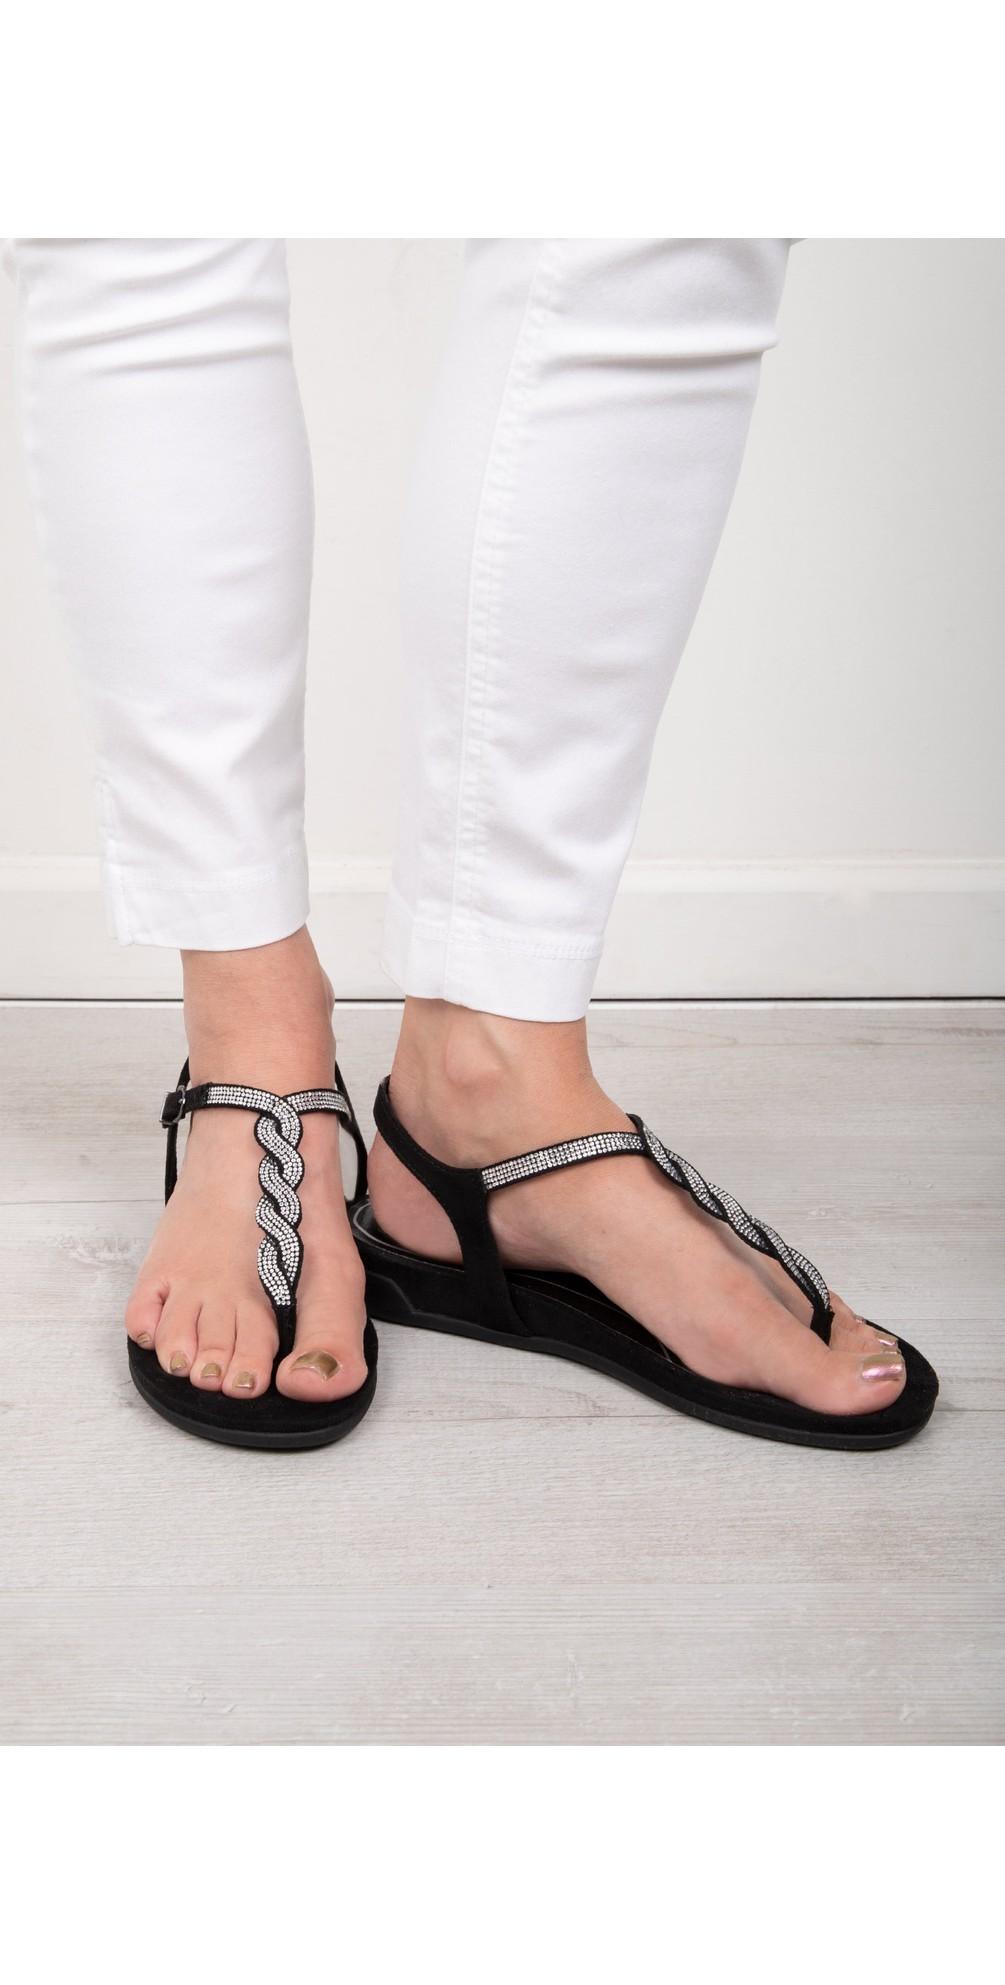 Moli Sandal main image